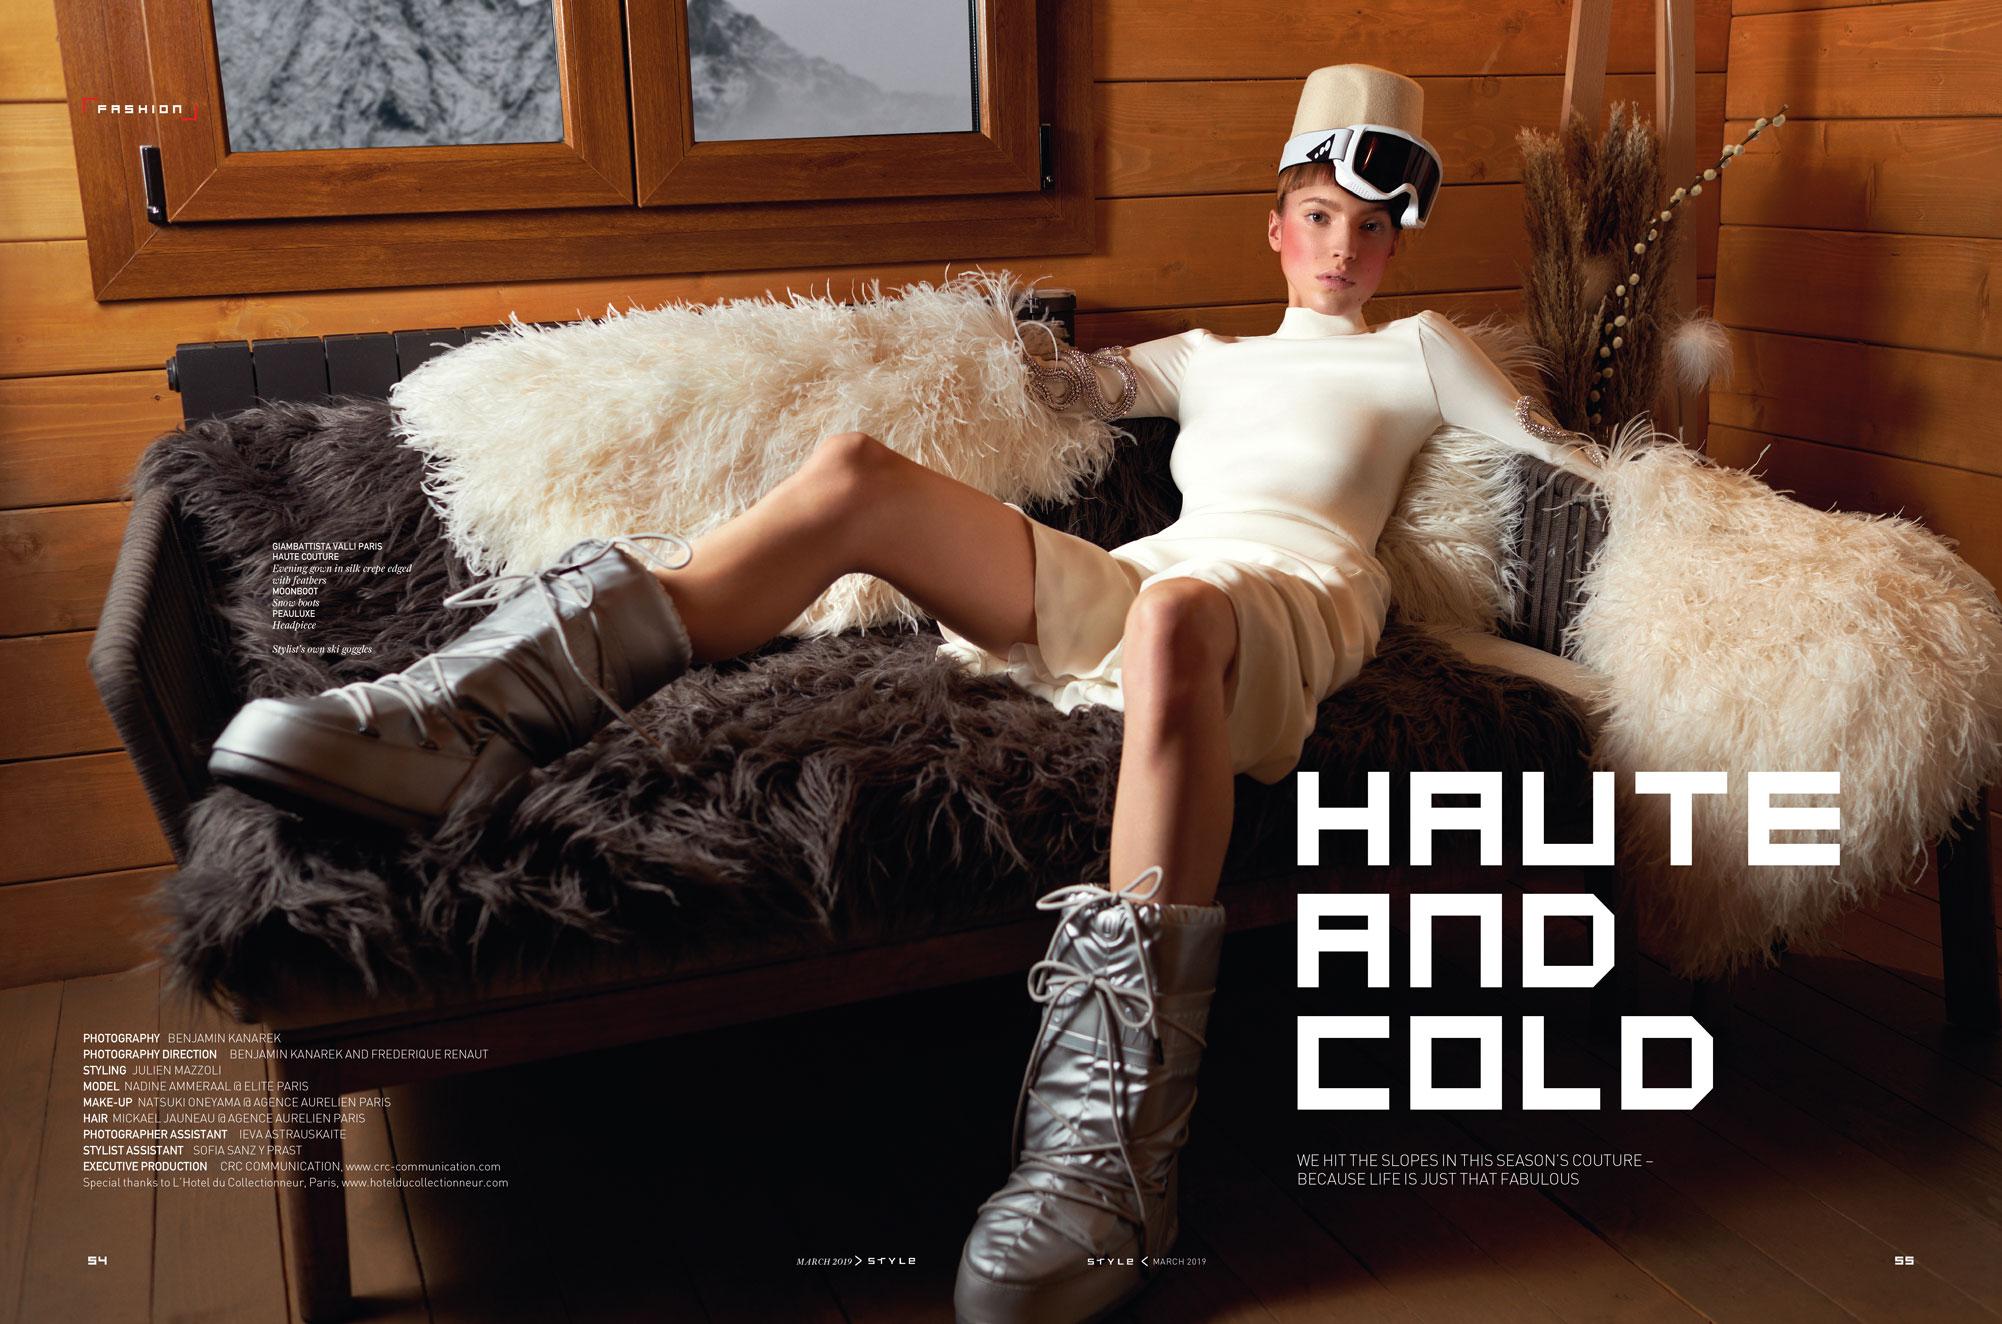 https://i2.wp.com/thebkmag.com/wp-content/uploads/2019/03/Nadine-Ammeraal-in-Haute-and-Cold-for-SCMP-Style-by-Benjamin-Kanarek-01.jpg?ssl=1